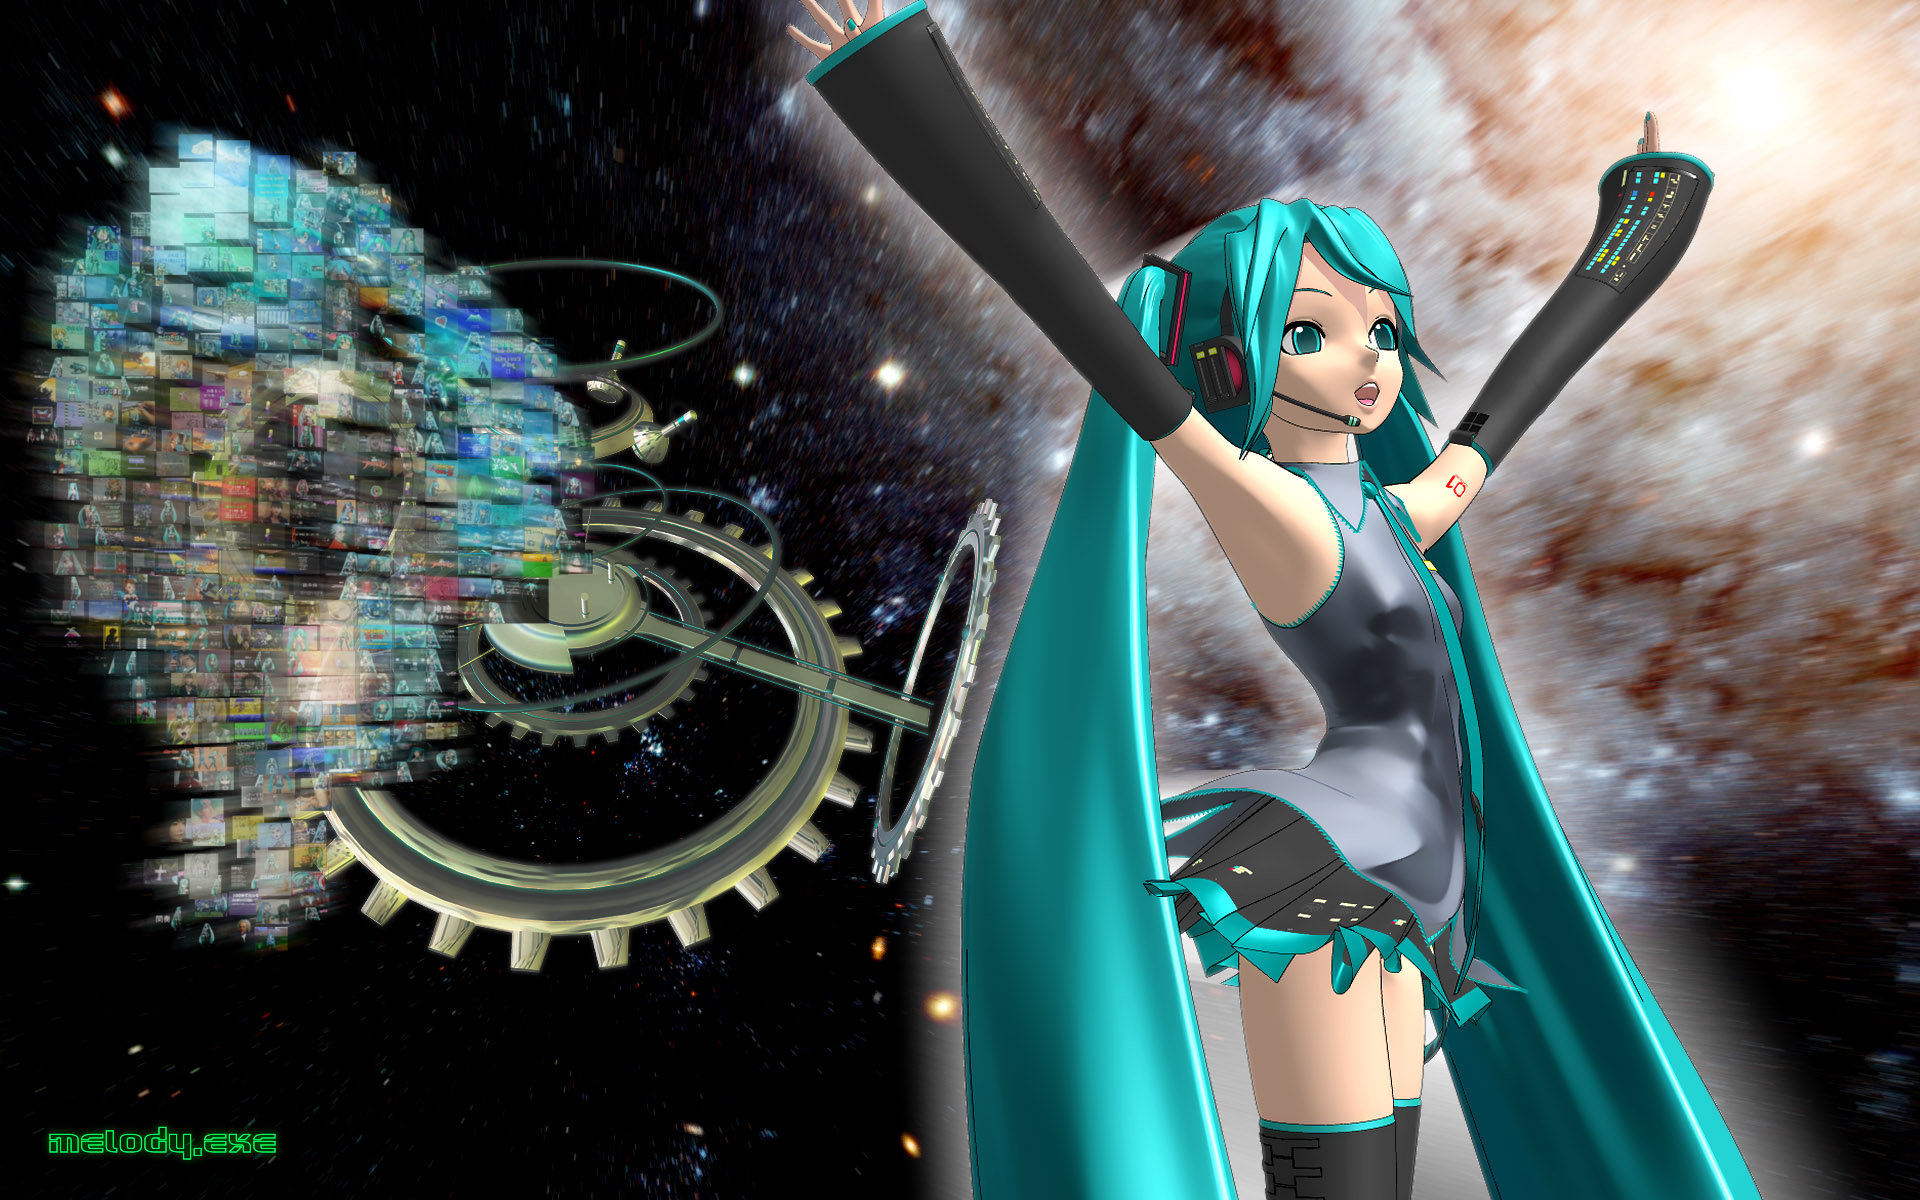 Hatsune Slides Into Air Hockey AR Demo For Vita